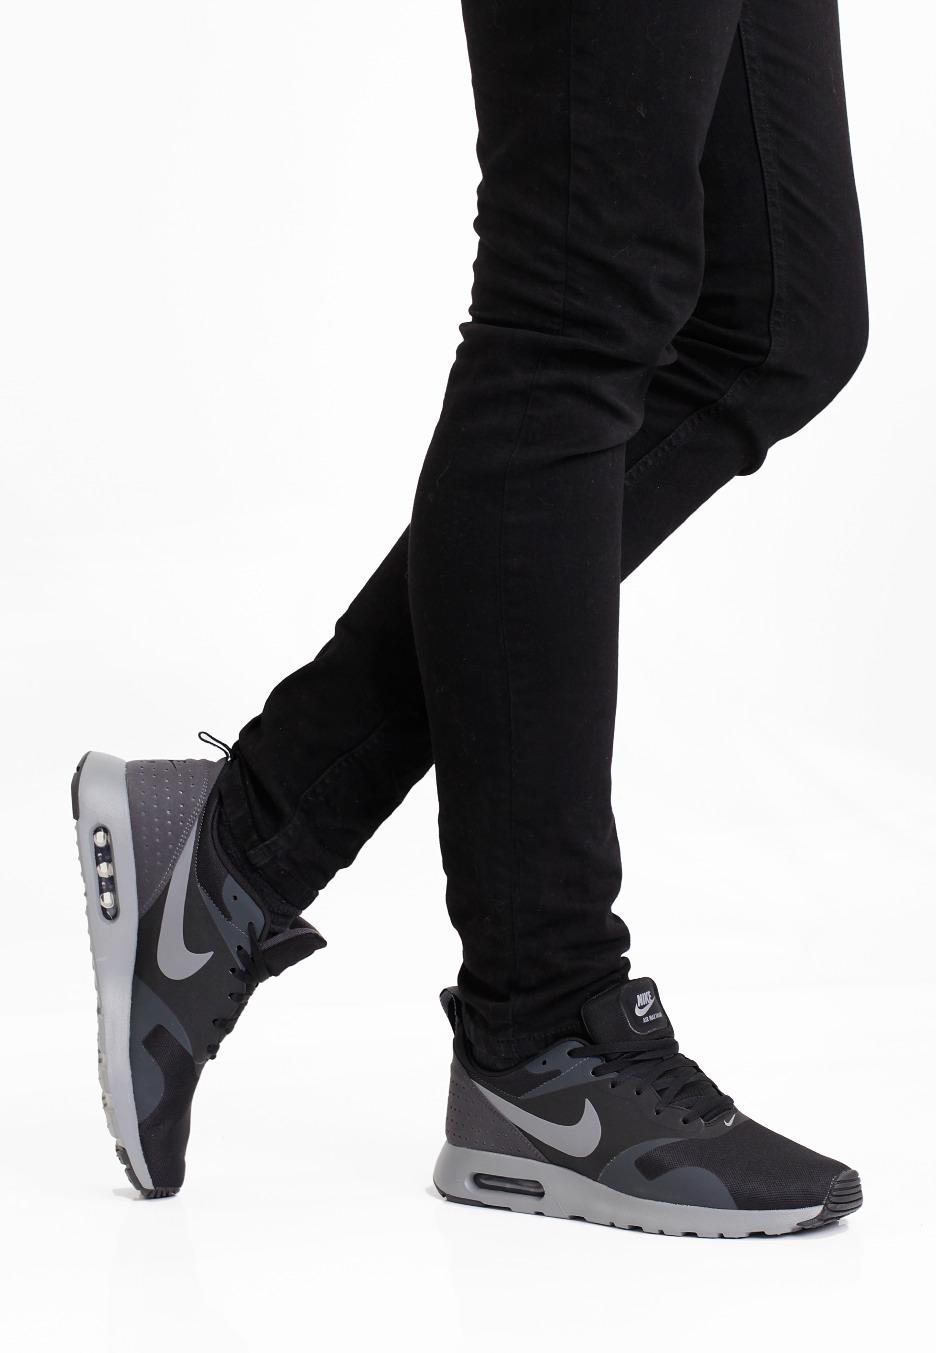 7806233a50 Nike - Air Max Tavas Black Cool Grey Anthracite - Shoes ...